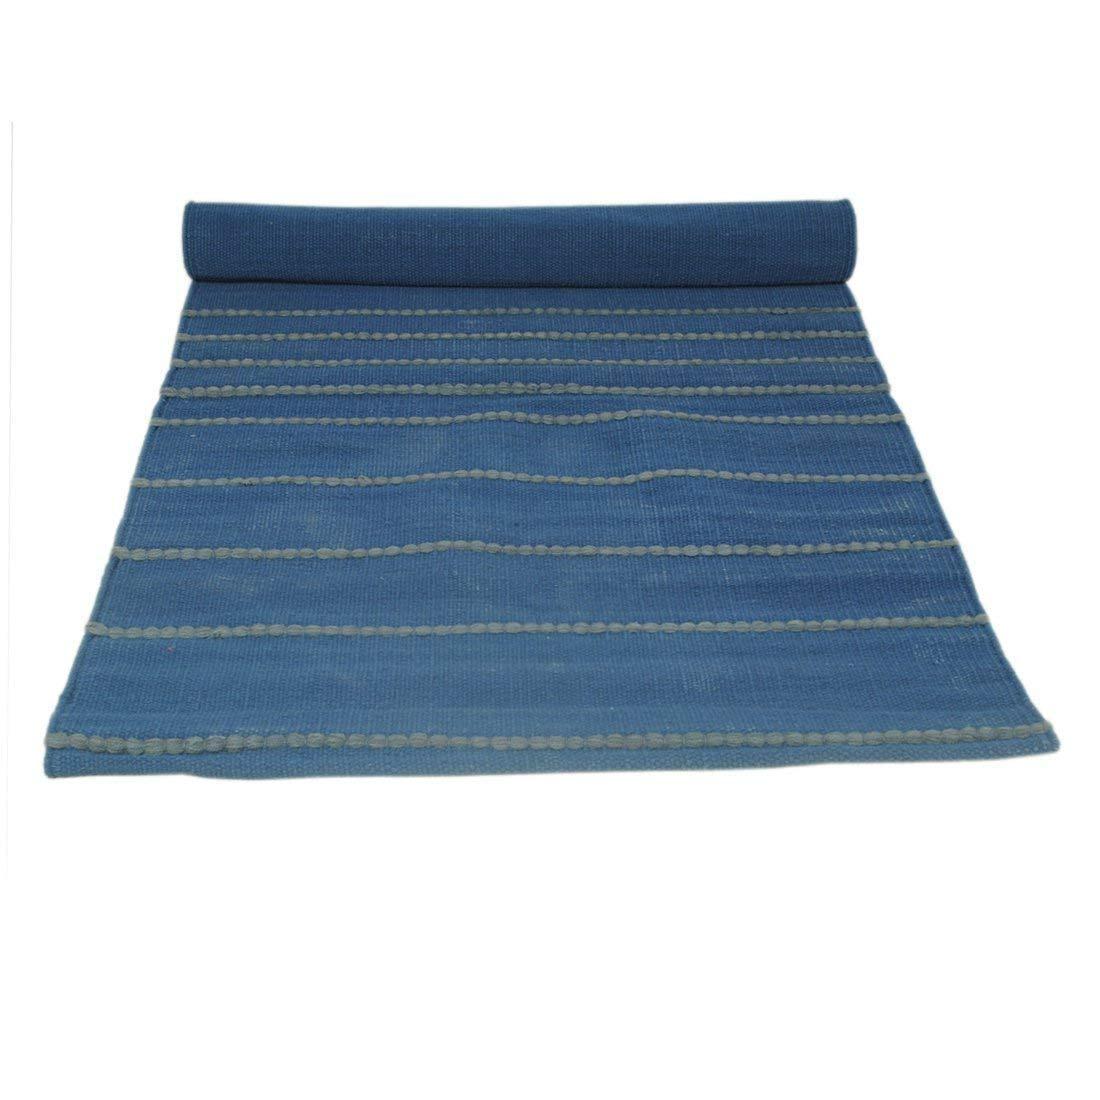 Organic cotton mat for Yoga, Pilates, Fitness, and Meditation - Blue